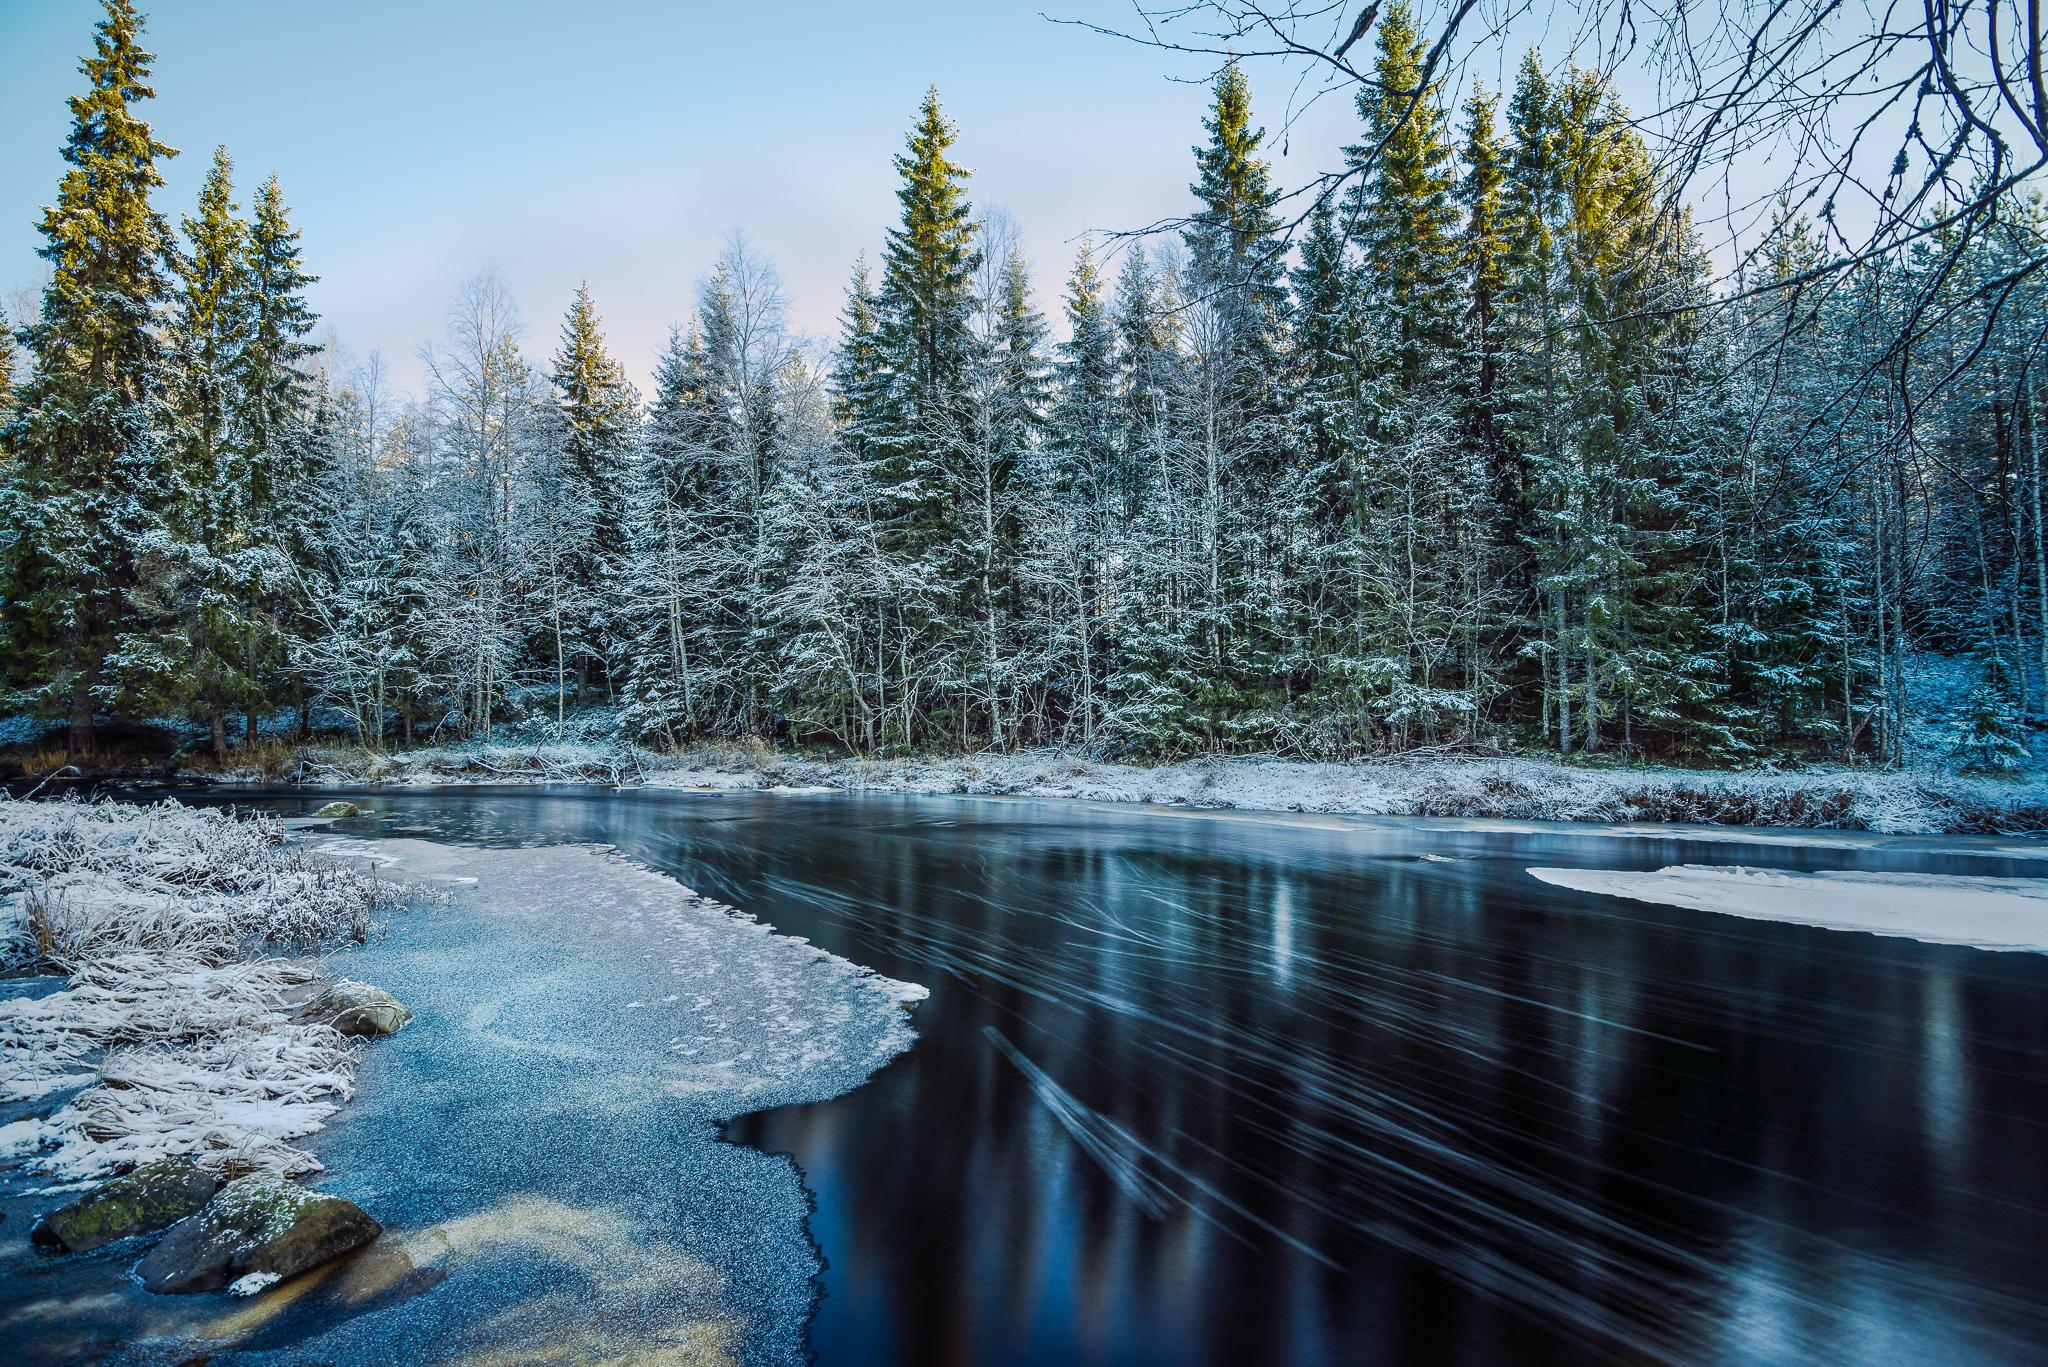 картинки река заснеженная цветочки карликового